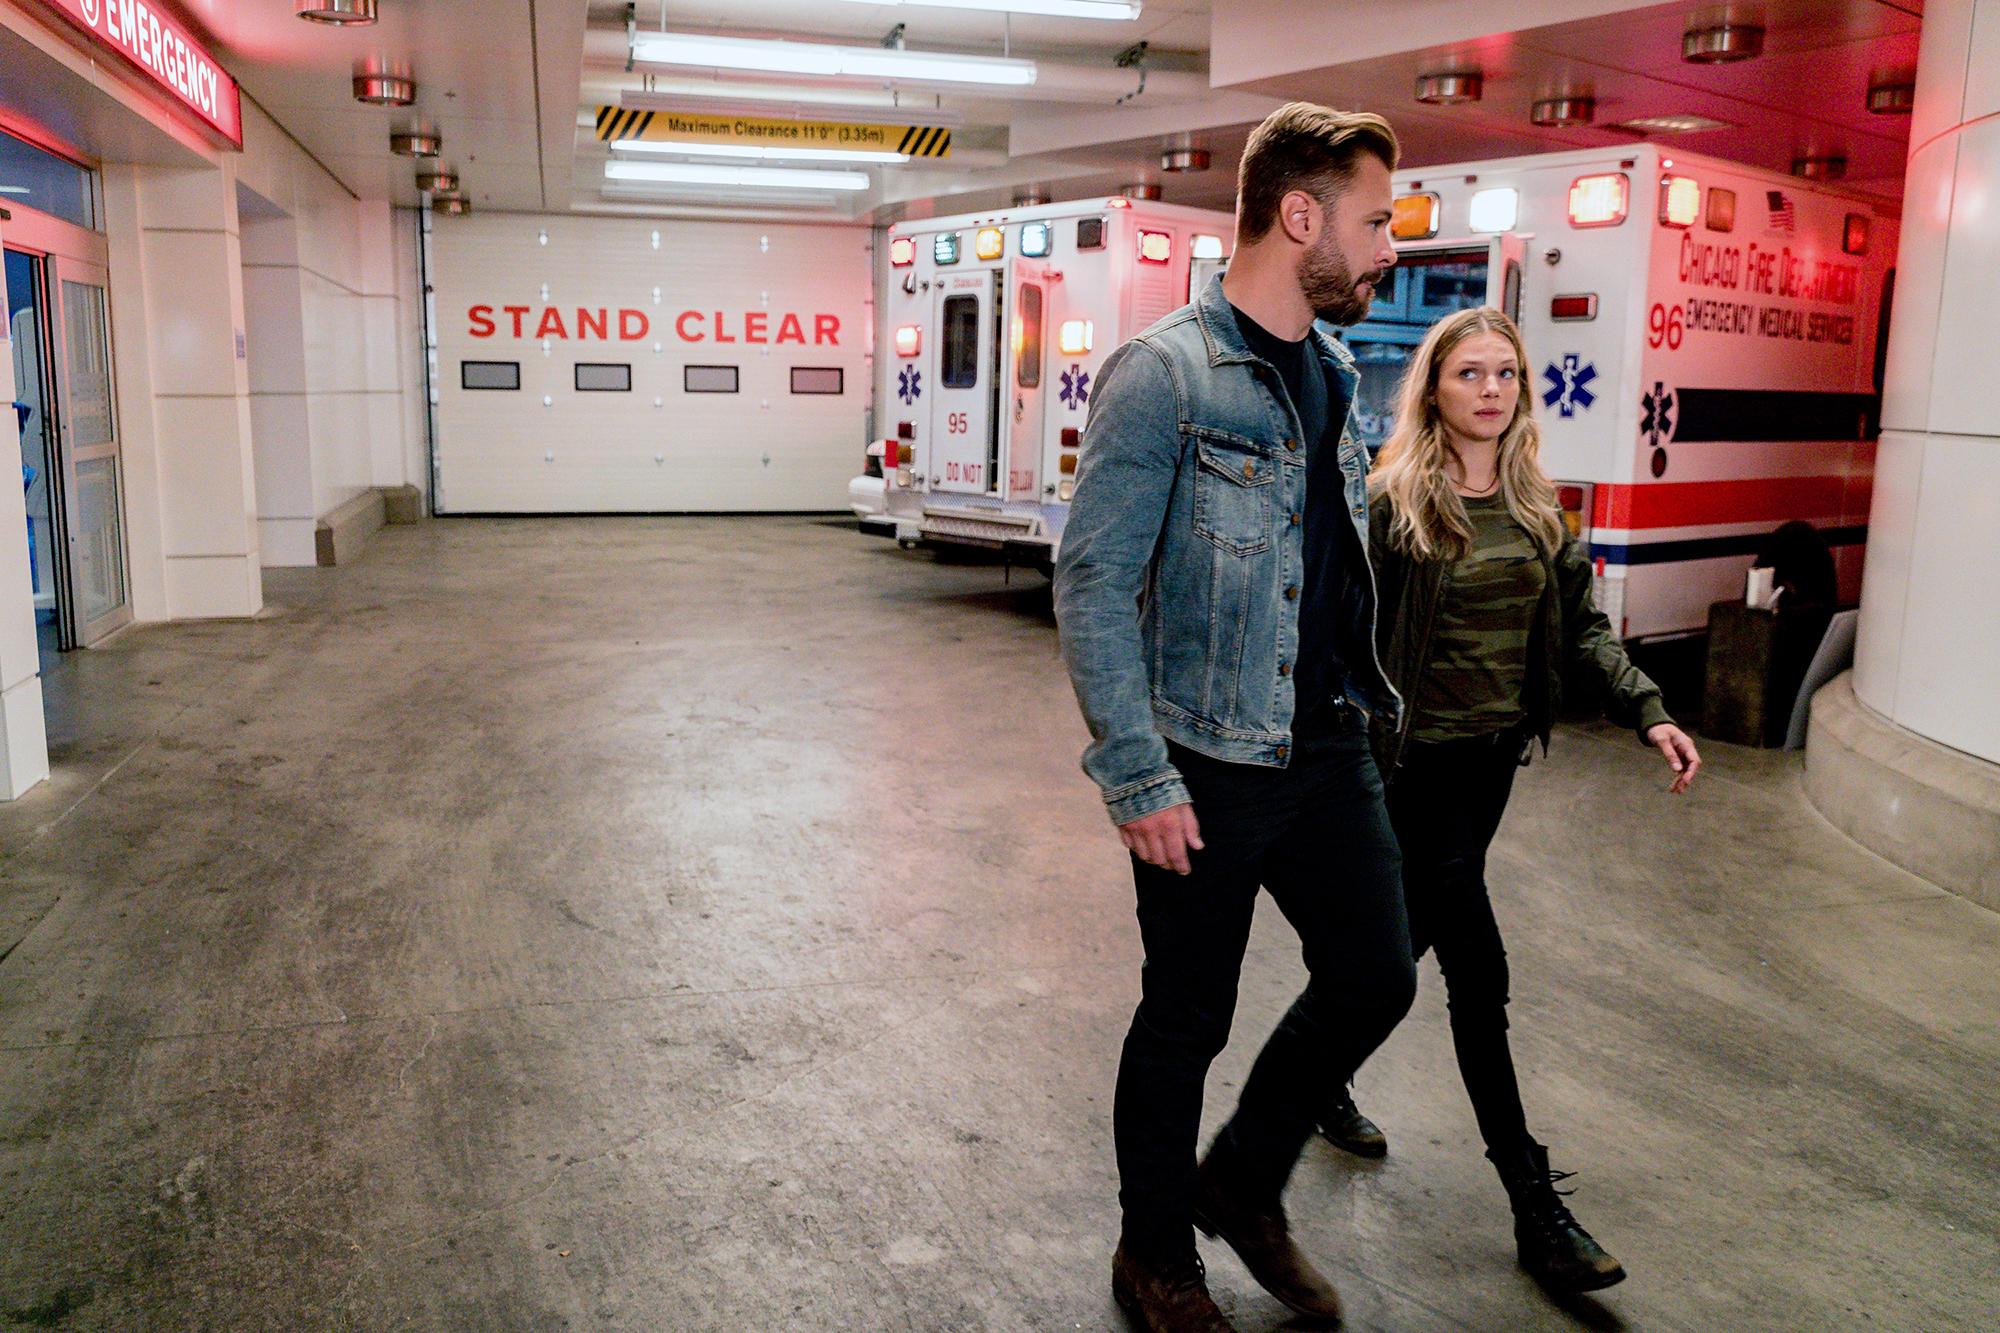 Chicago P.D.'s Patrick Flueger Worries Fans Will 'Be Pissed Off' Over Romance Twist - Patrick John Flueger as Adam Ruzek and Tracy Spiridakos as Hailey Upton in 'Chicago P.D.'